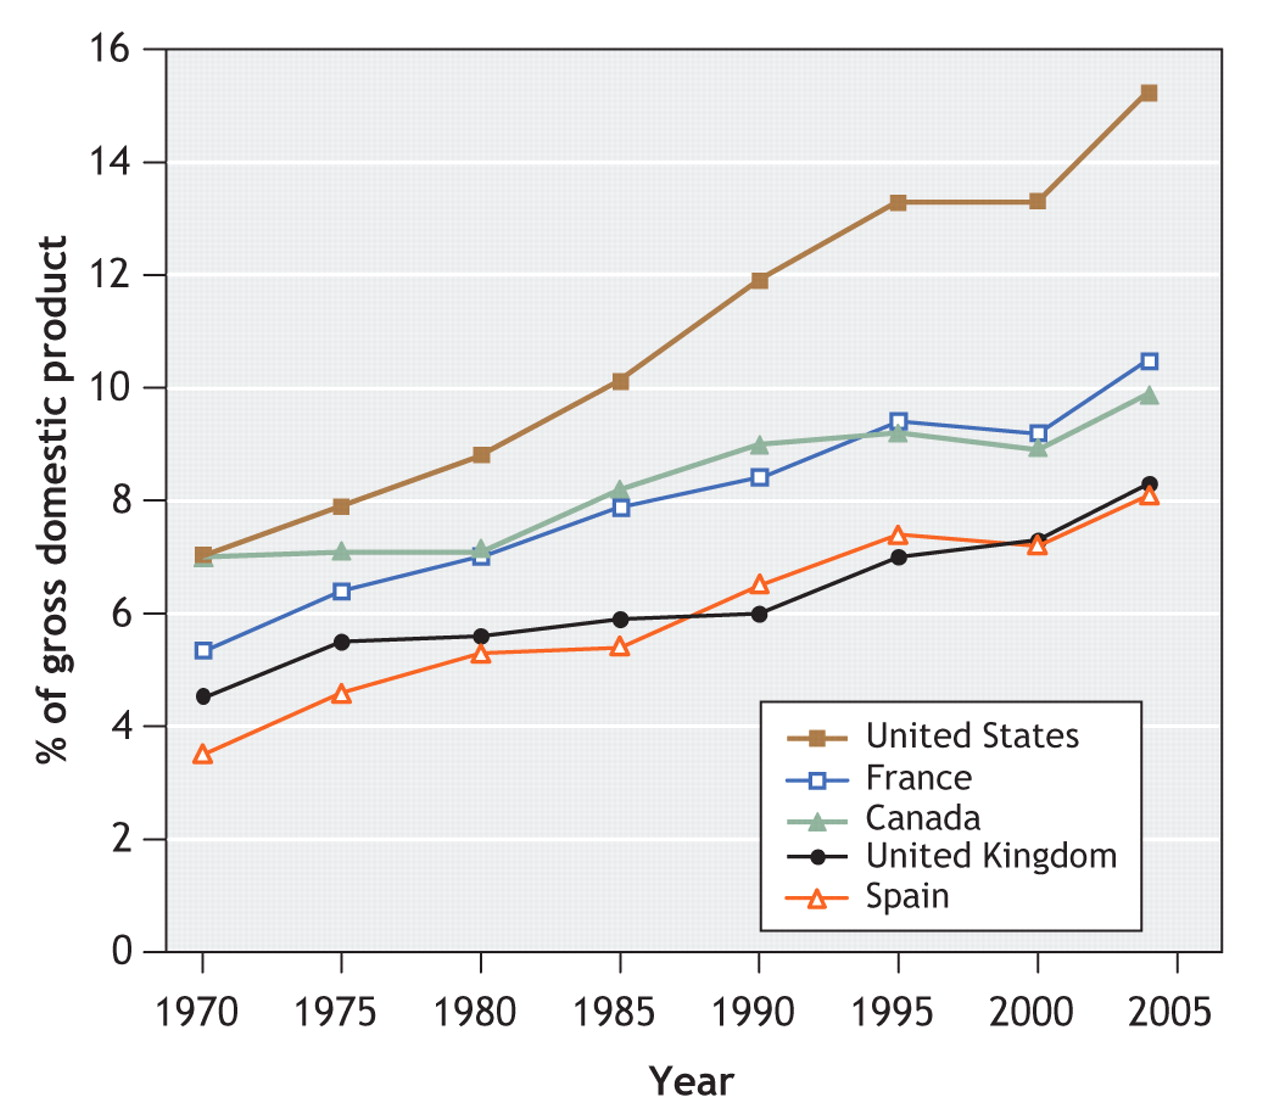 Gráfico evolución gasto sanitario sobre PIB